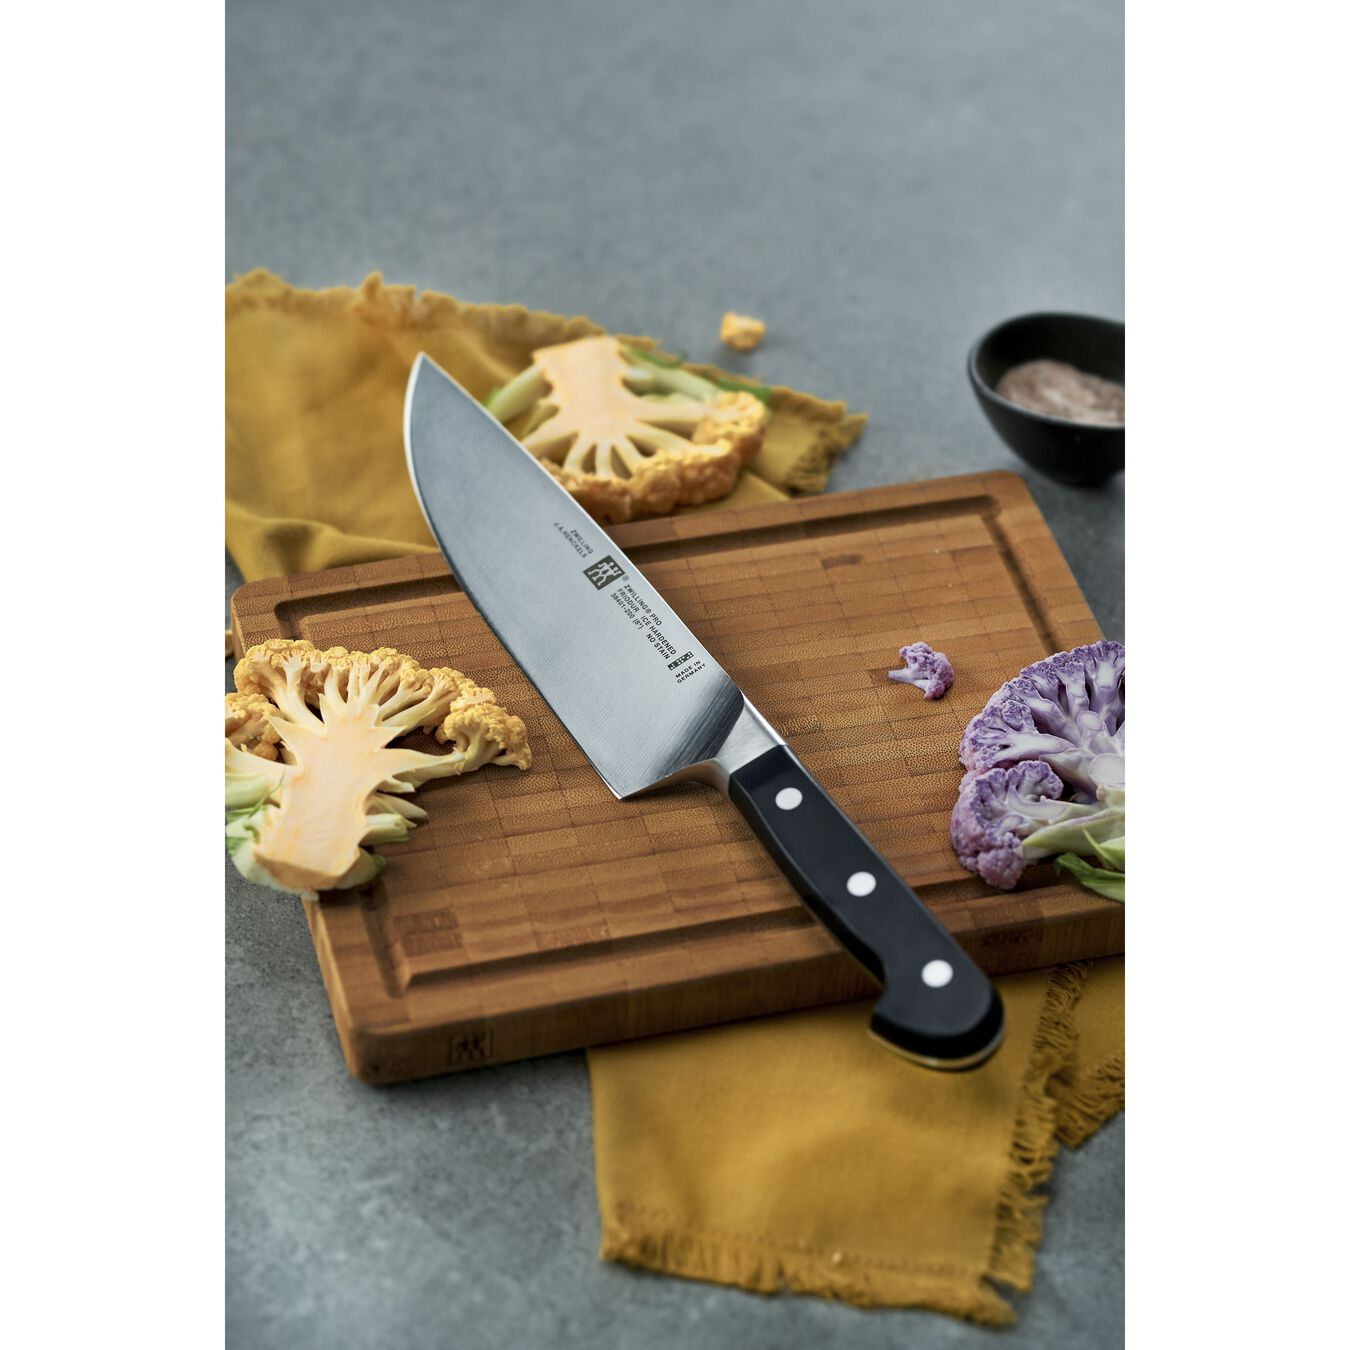 Kochmesser 20 cm, (keine spezielle Farbe), Kunststoff,,large 4